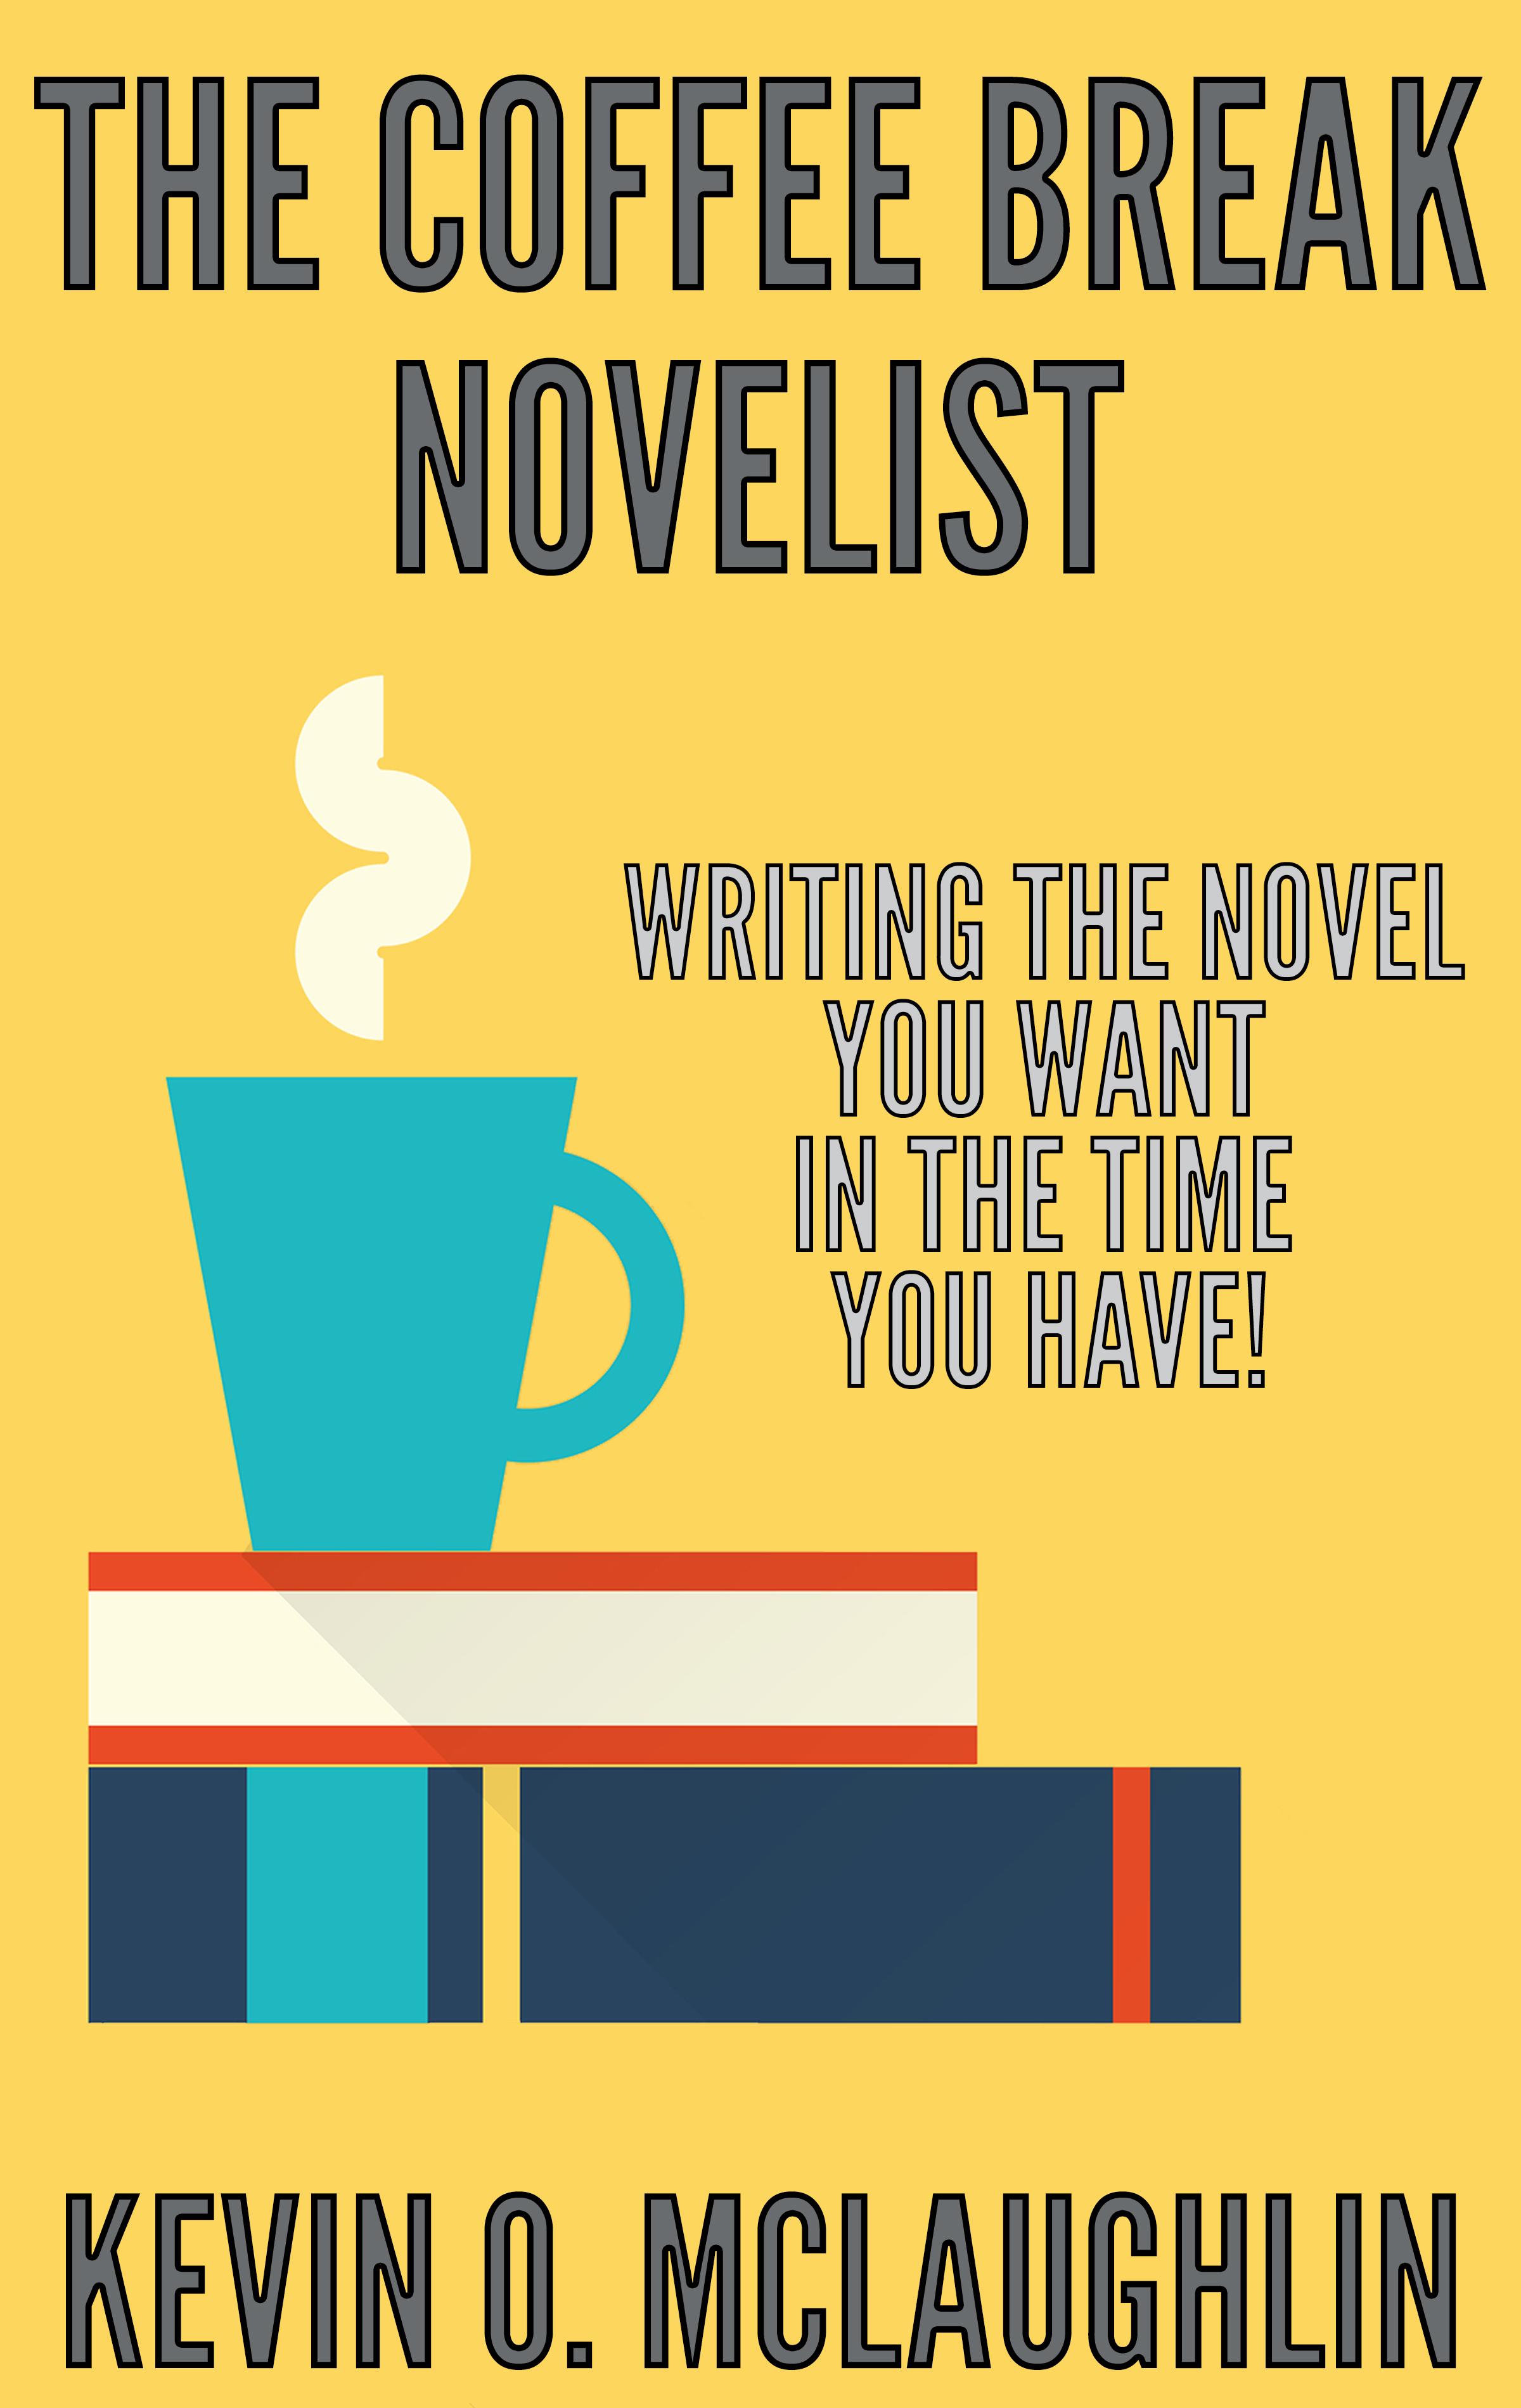 Coffee break novelist